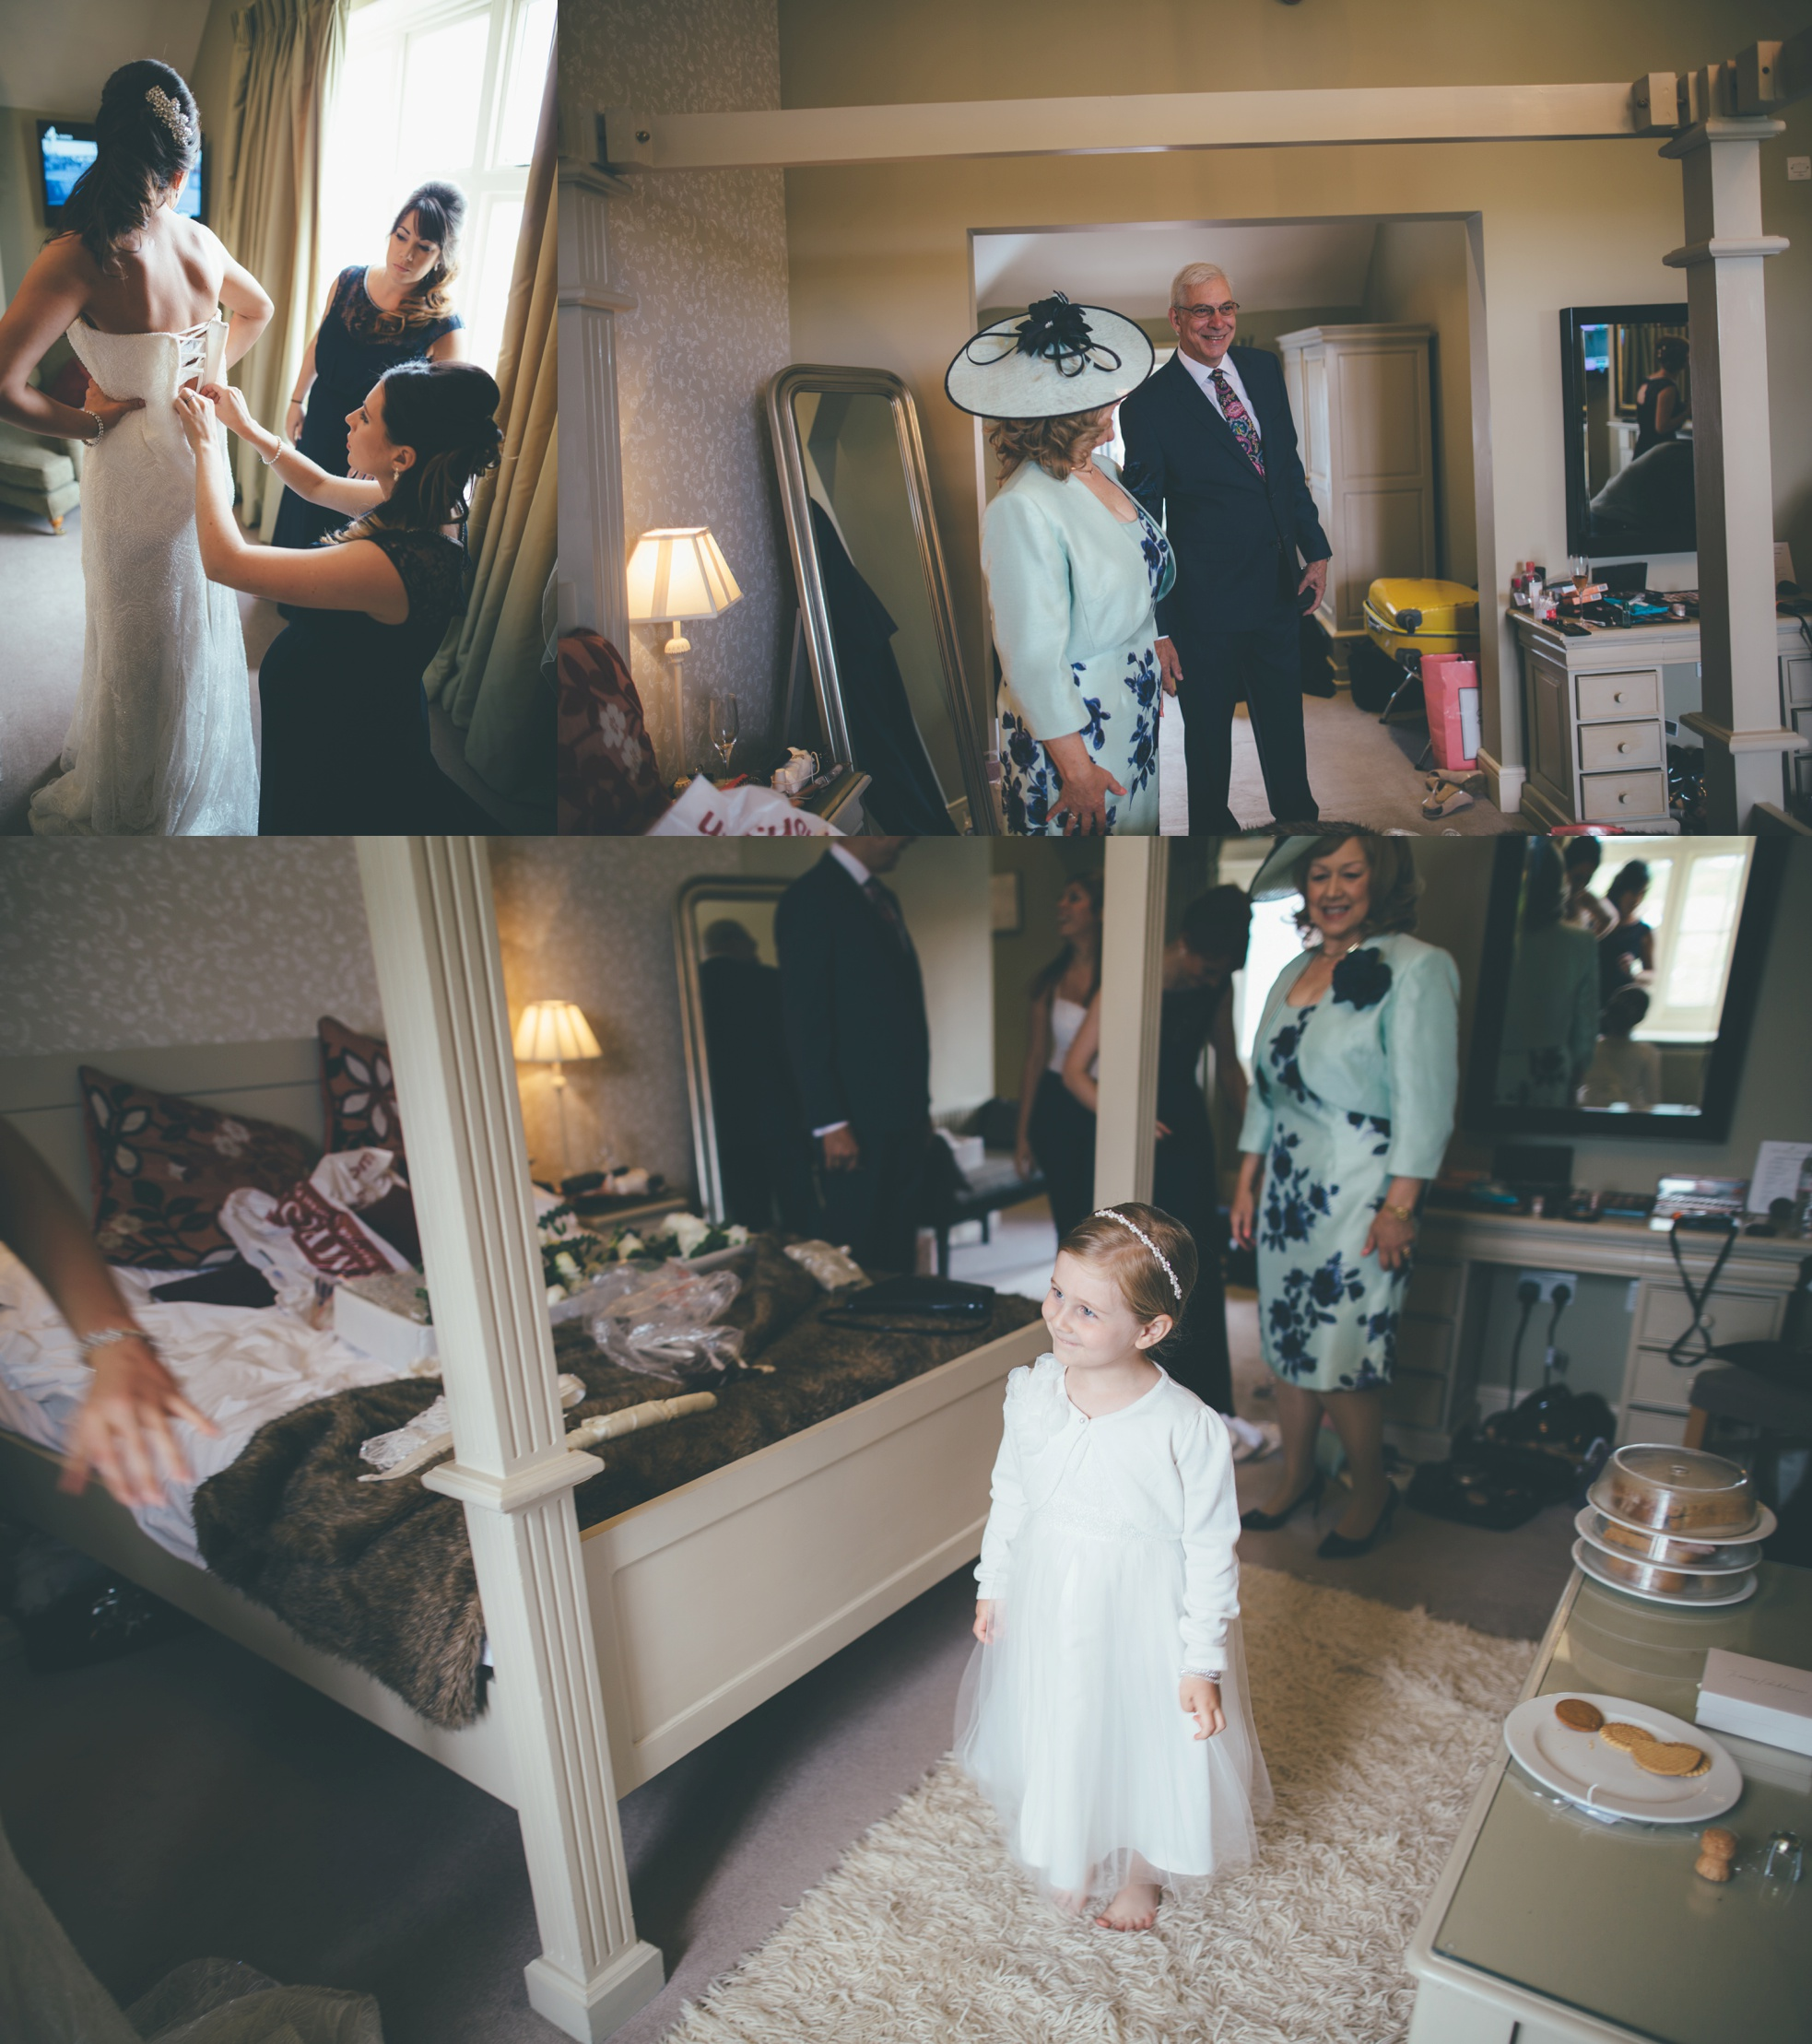 ClaireKieranwedding_PrestonCourtCanterbury_0004.jpg